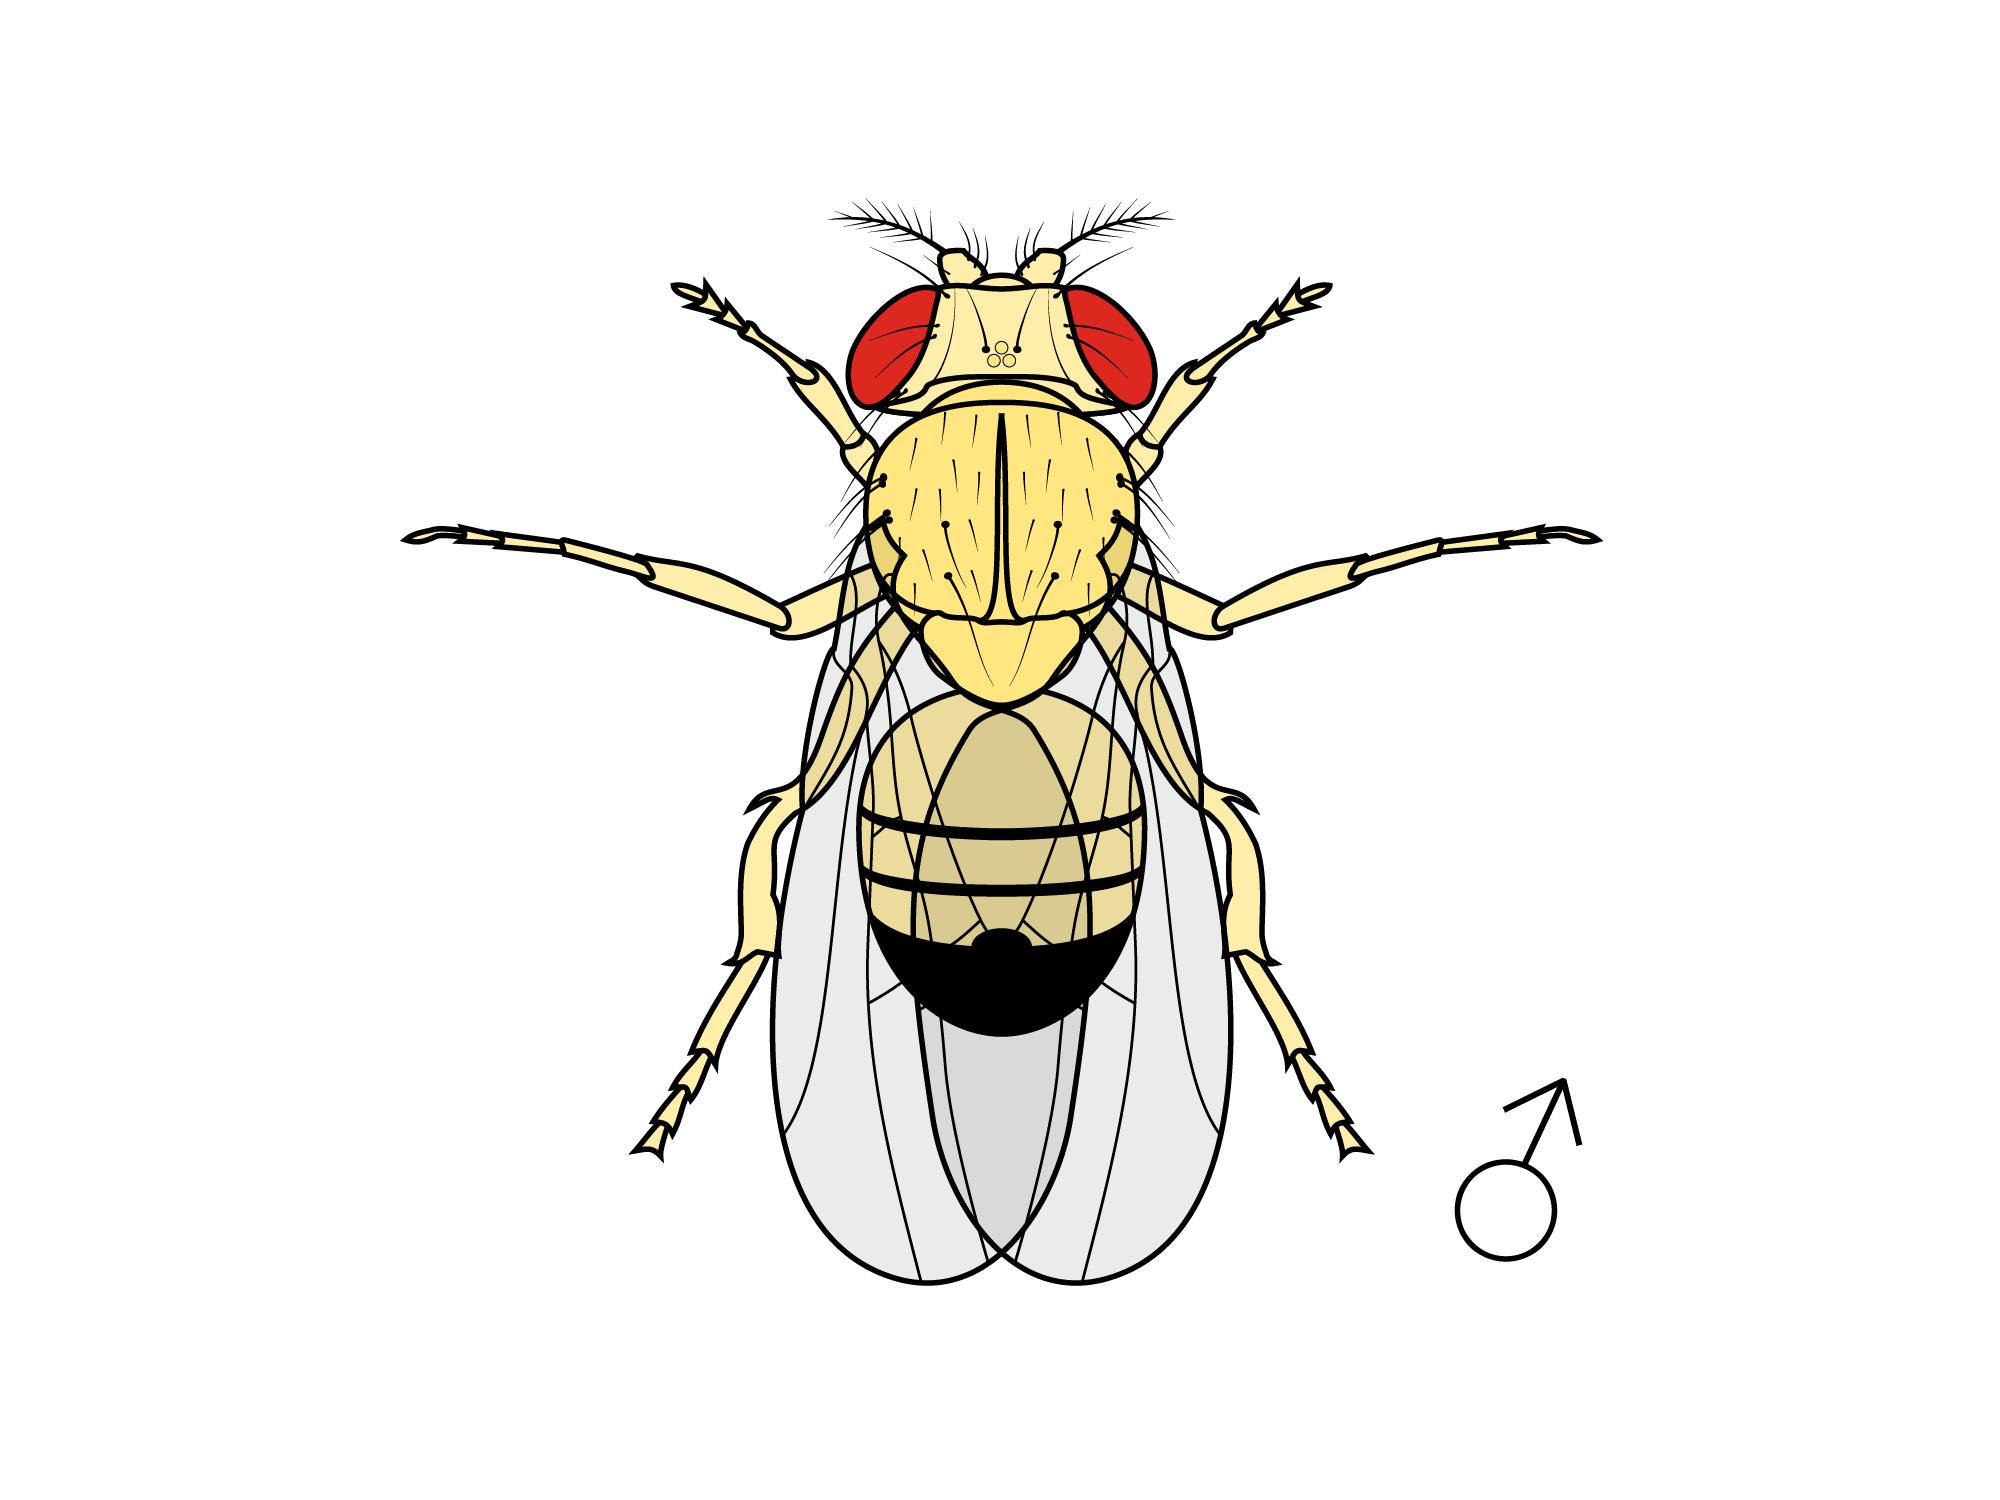 Yellow gene mutant drosophila